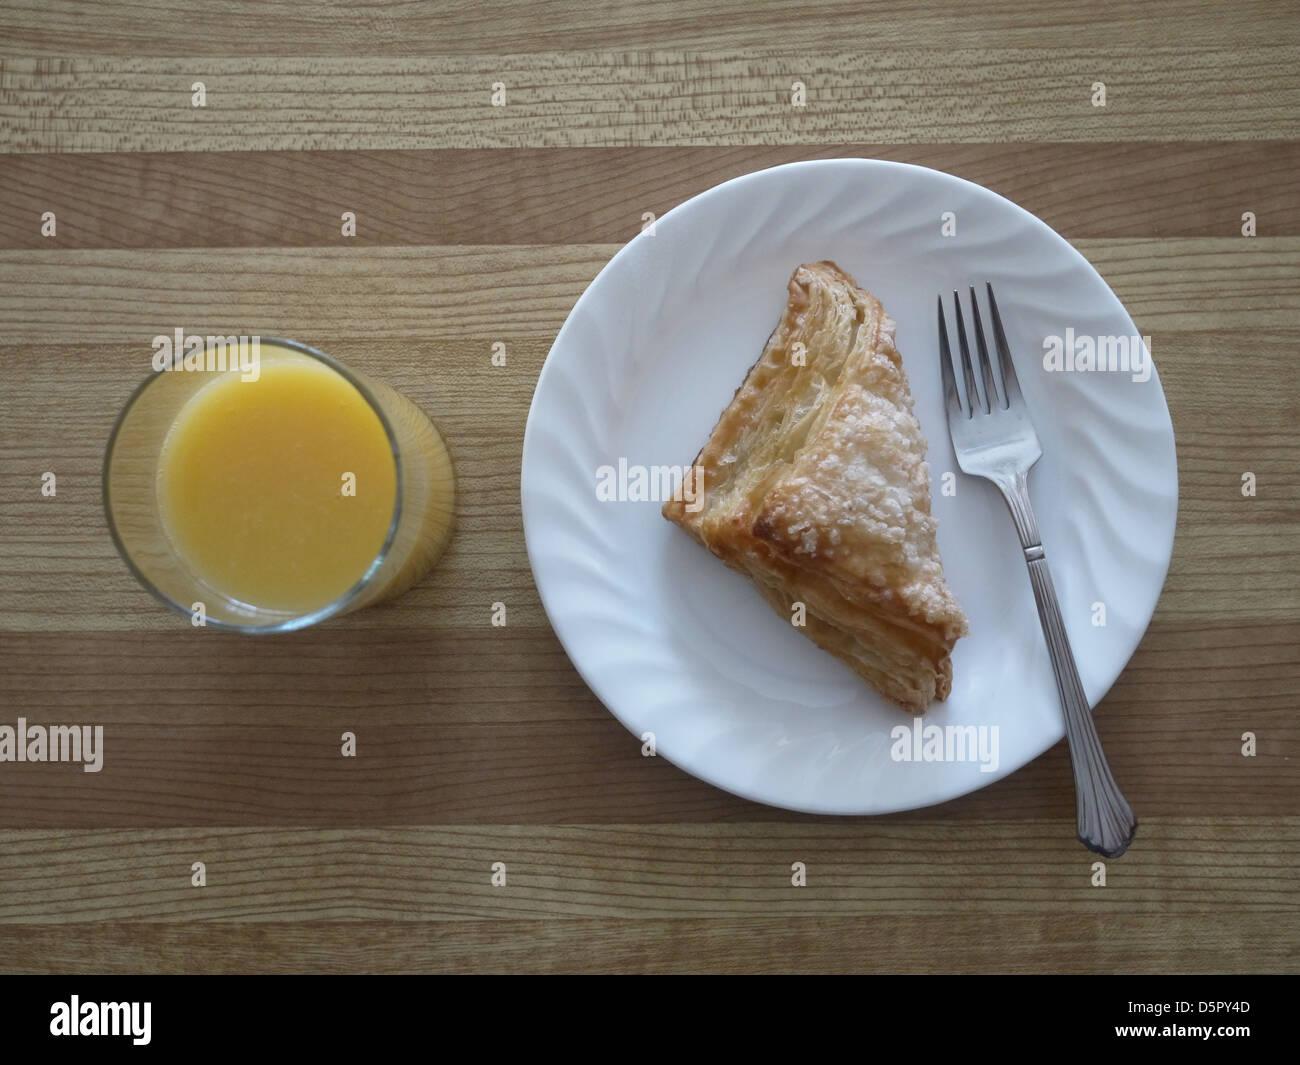 orange juice apple turnover plate fork - Stock Image